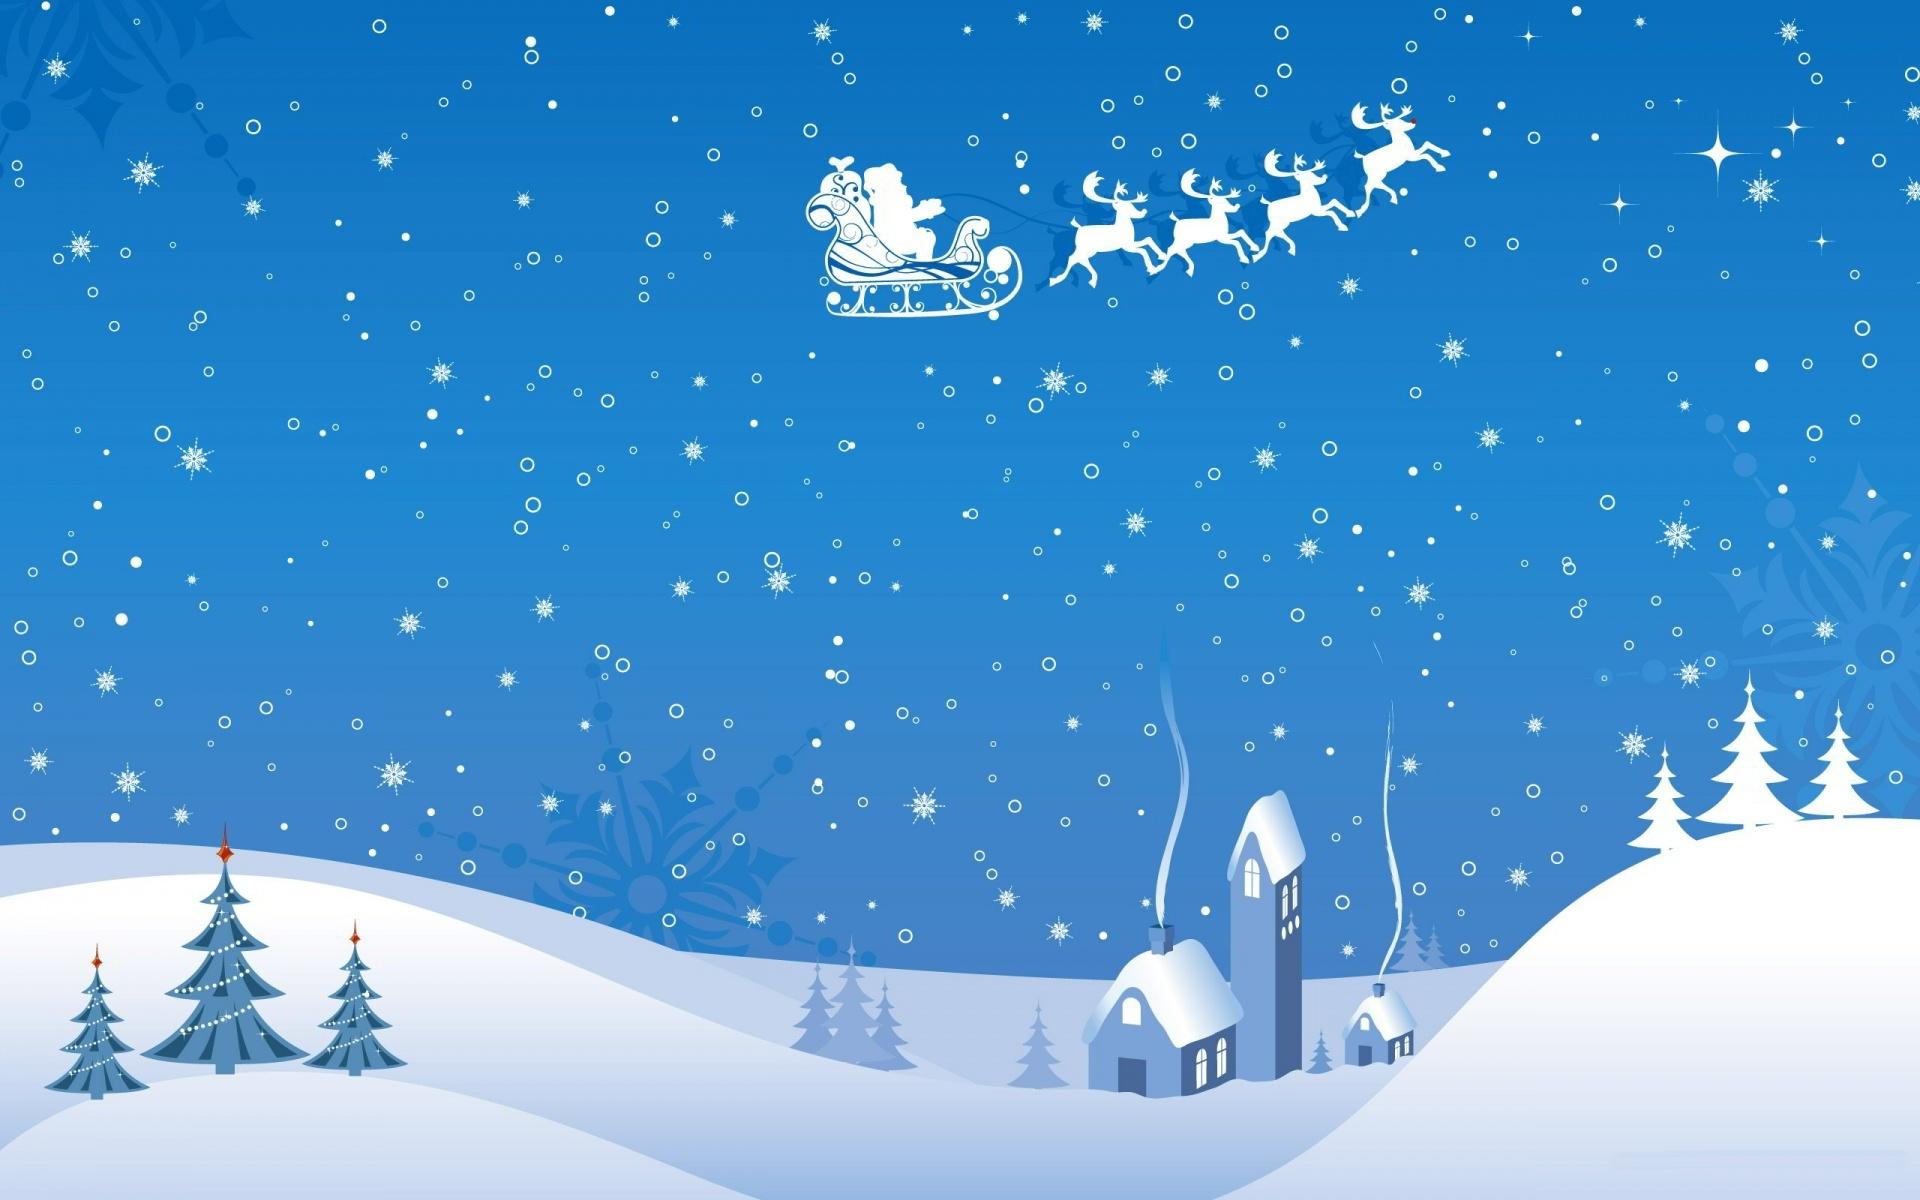 Wallpaper flight deer smoke snowfall santa claus house snow 1920x1200